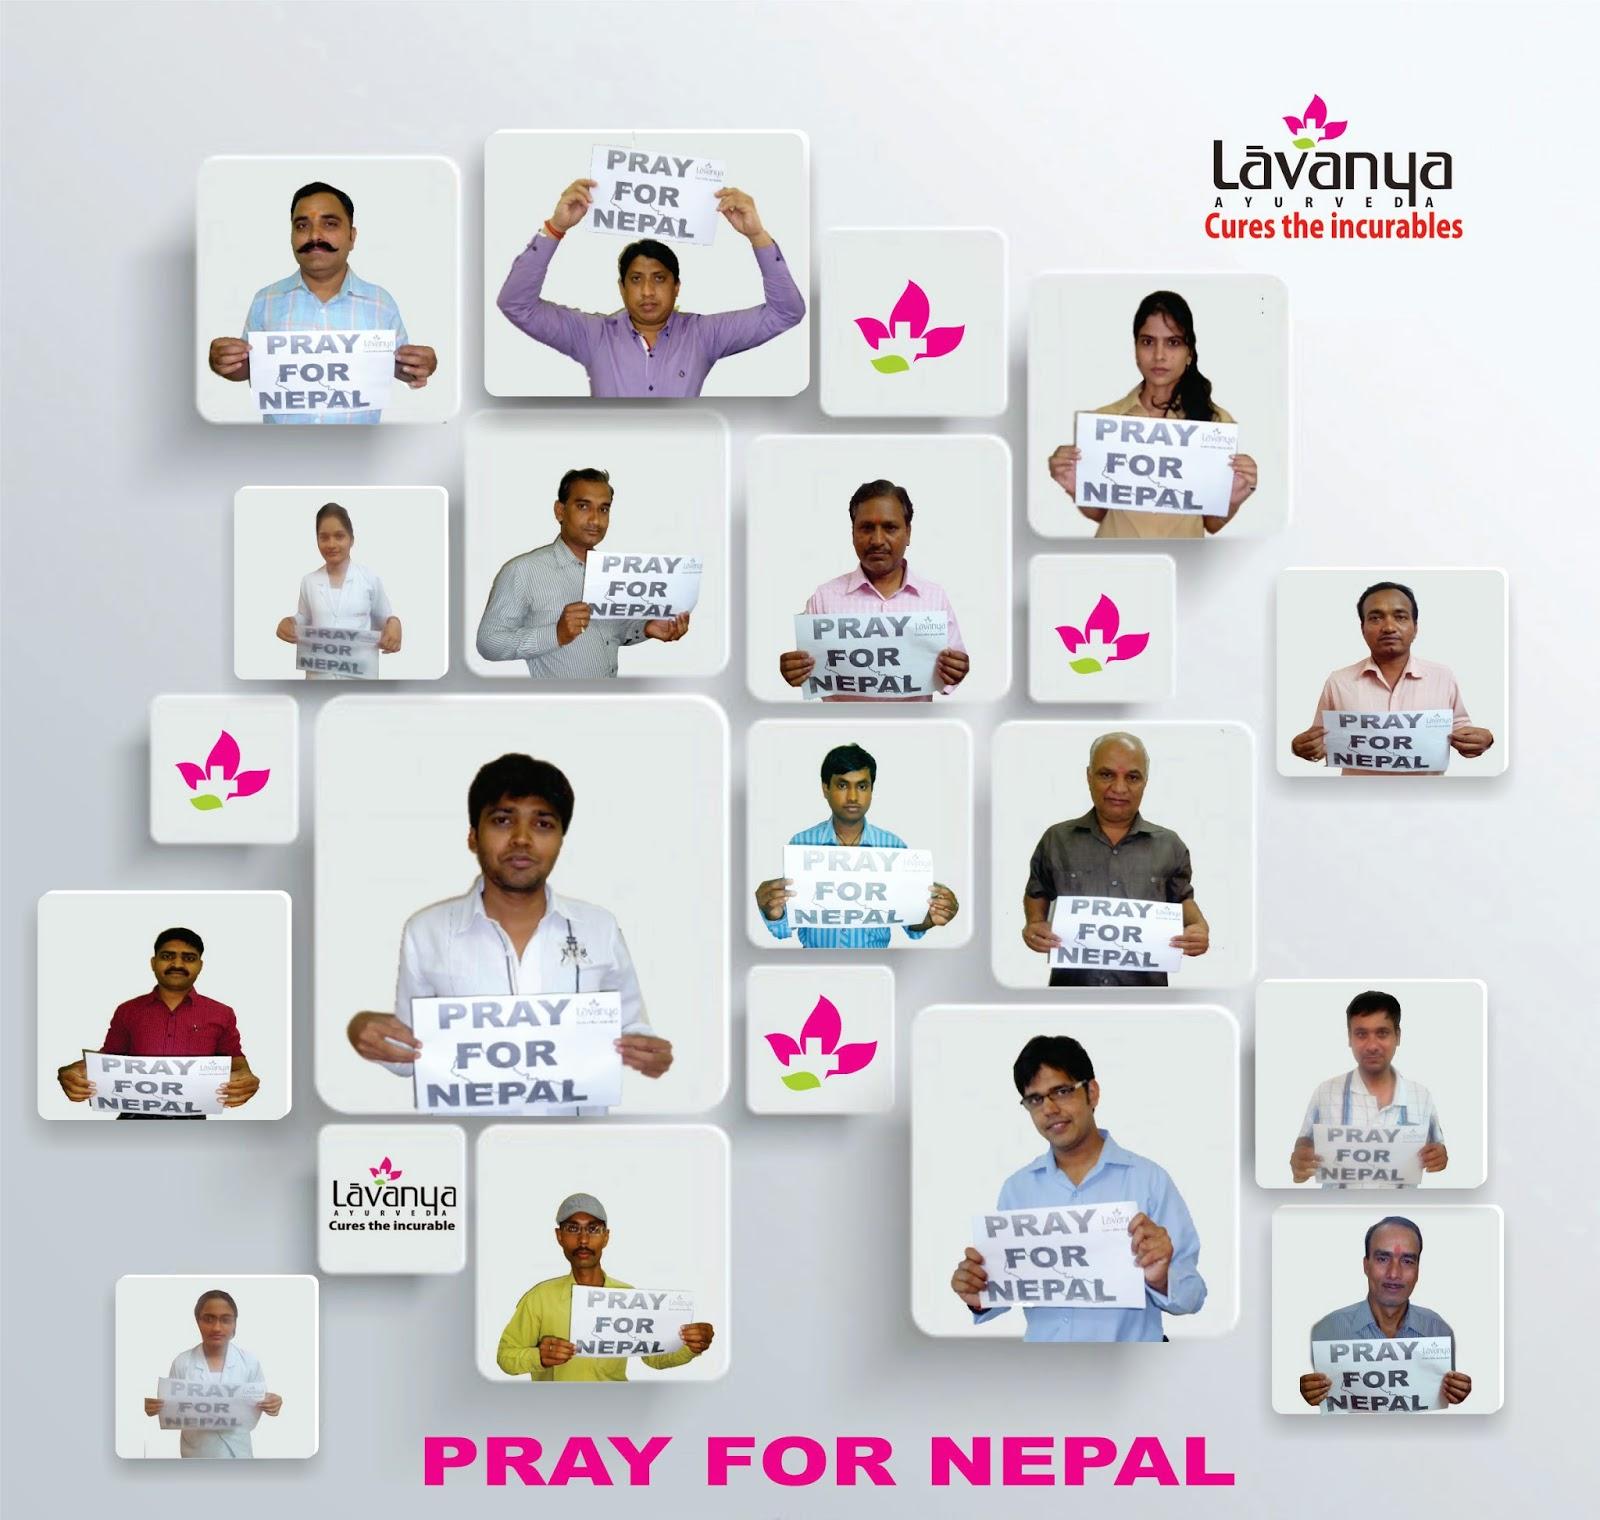 www.lavanyaayurveda.com